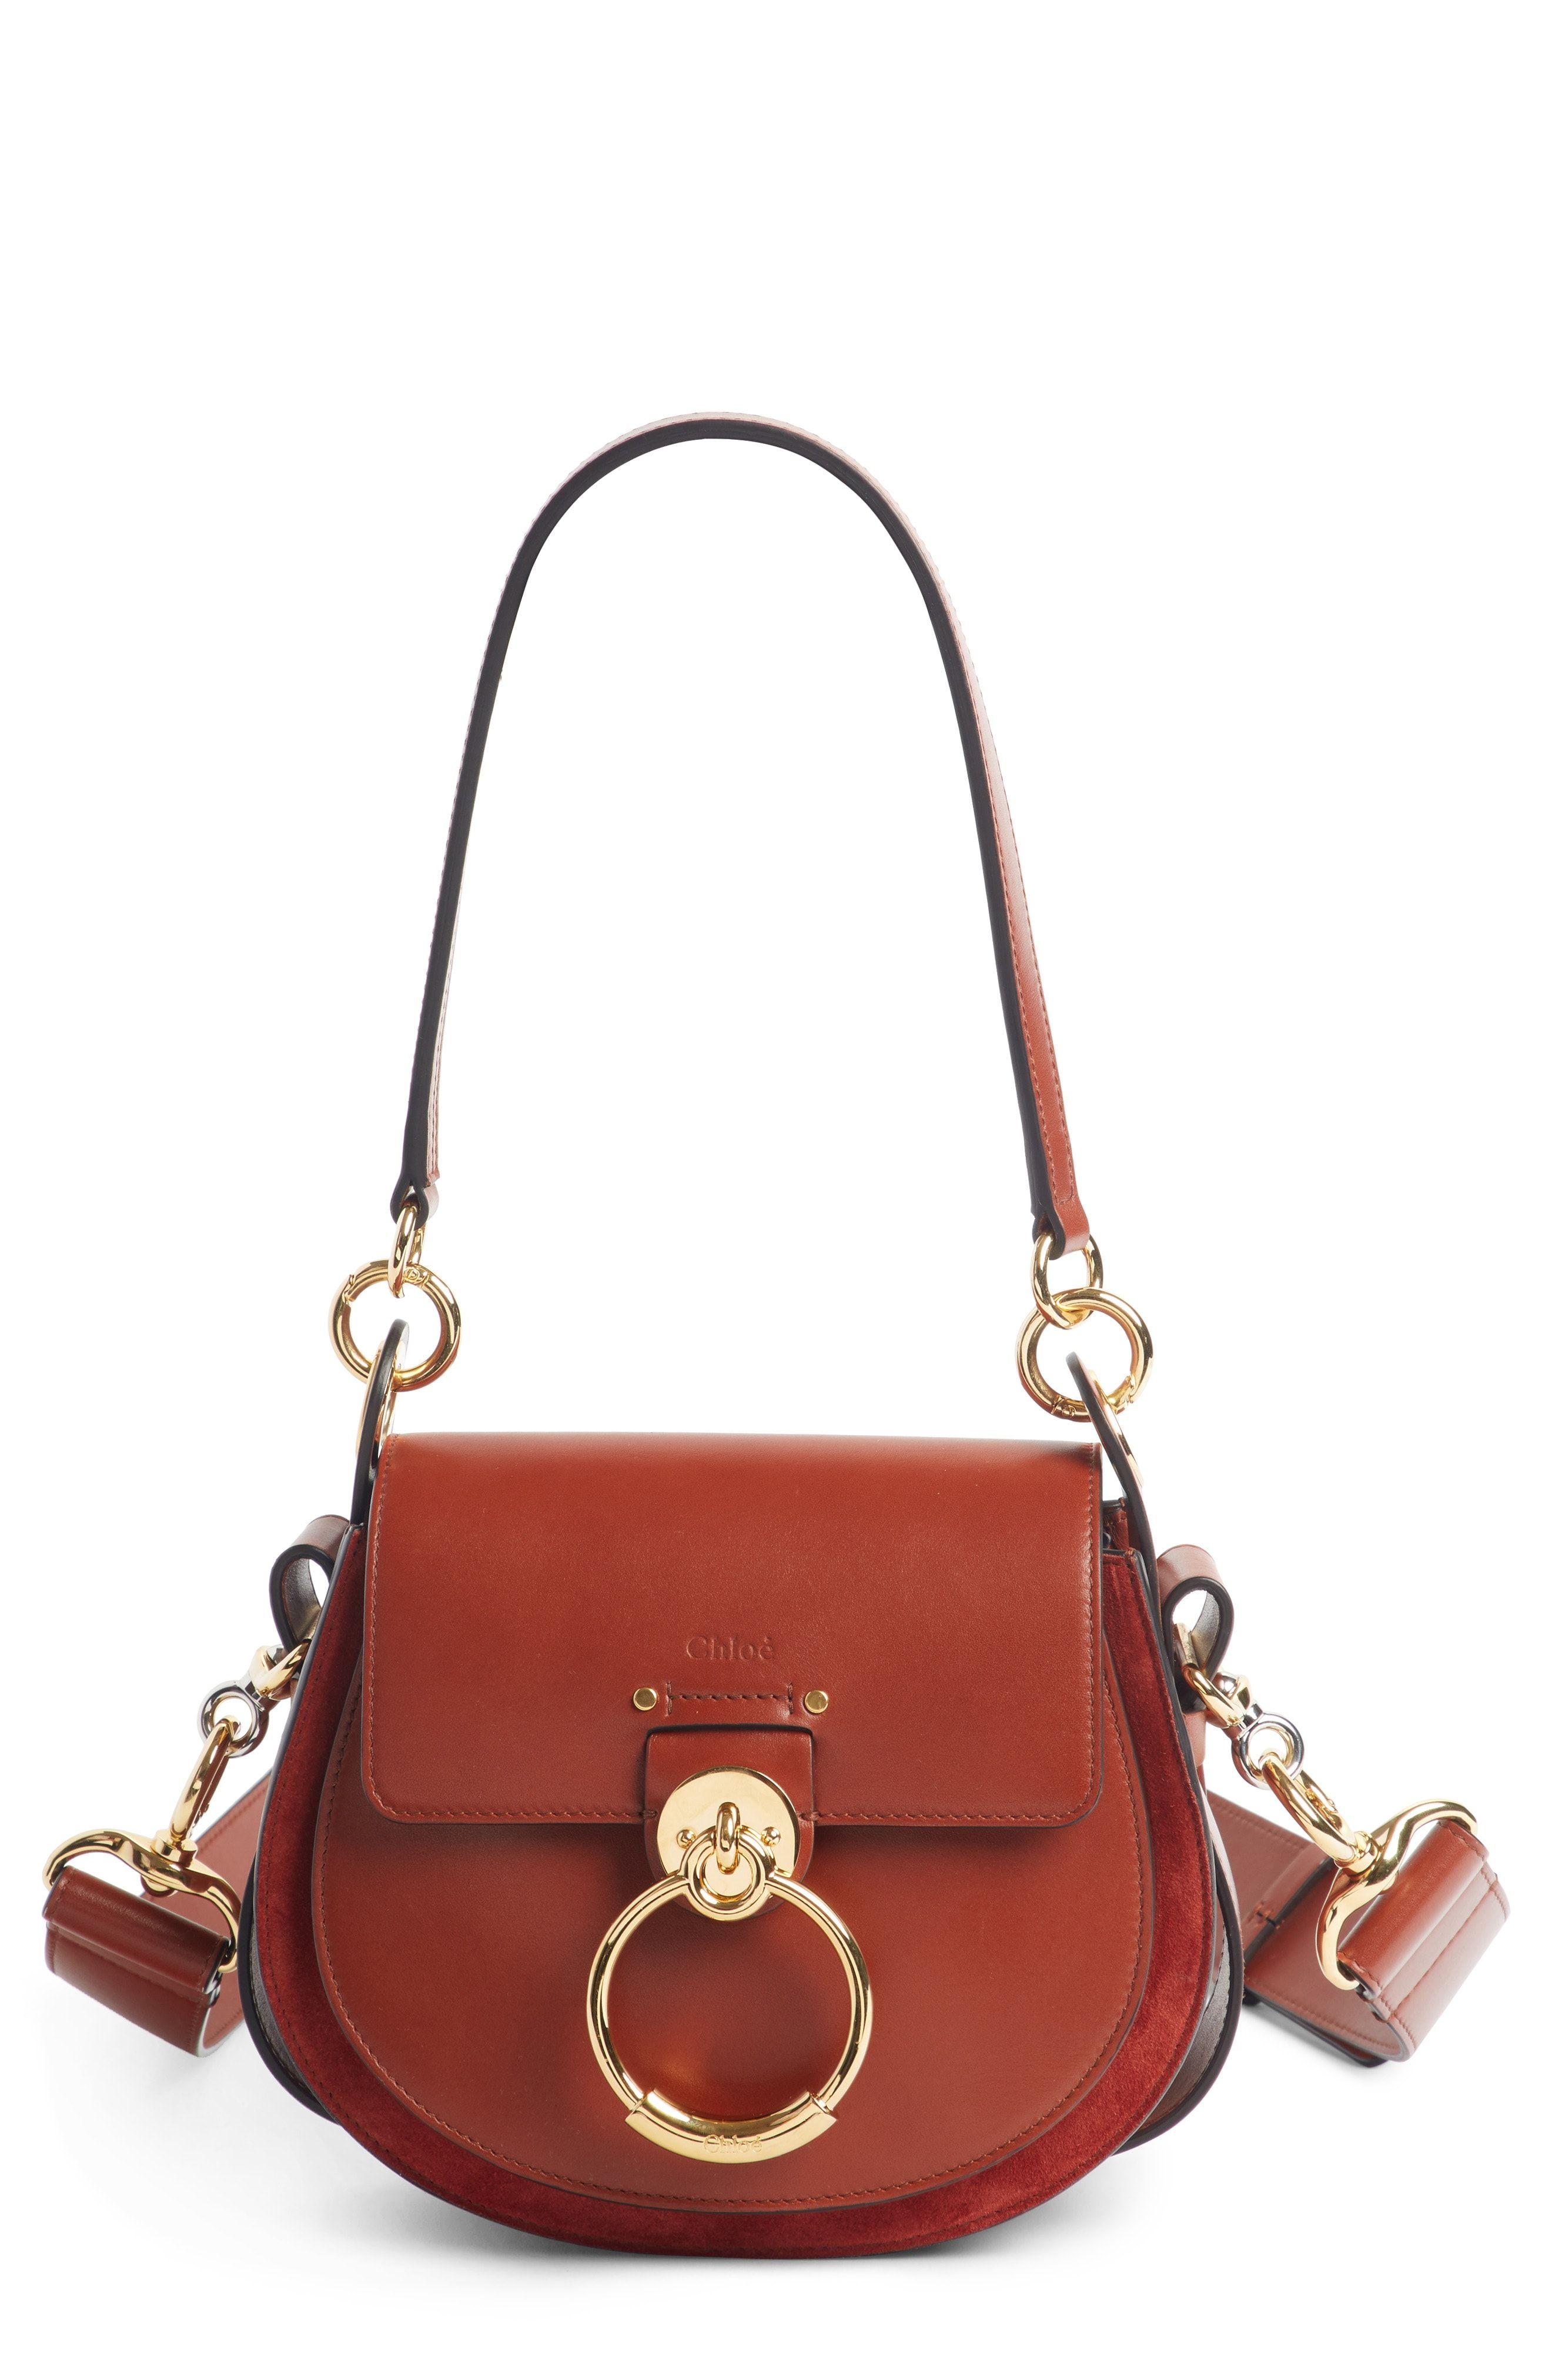 b27391acbdf5 Obsessed! Chloé Small Tess Calfskin Leather Shoulder Bag